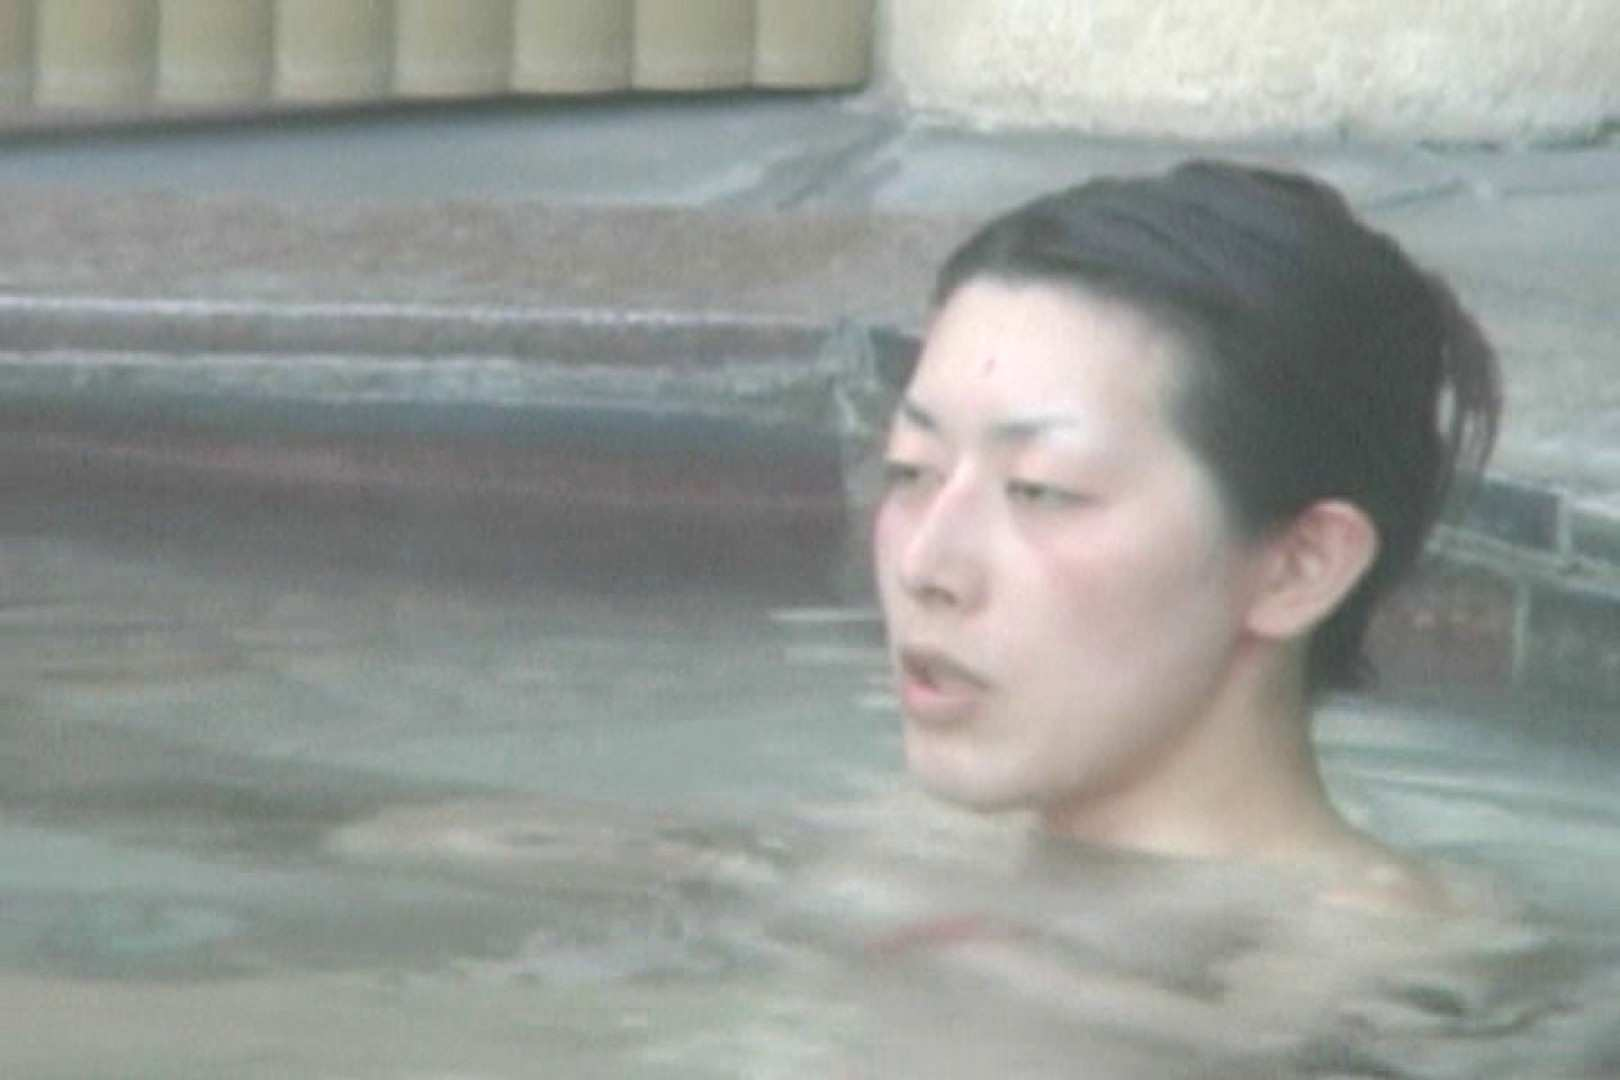 Aquaな露天風呂Vol.589 0   0  74連発 5